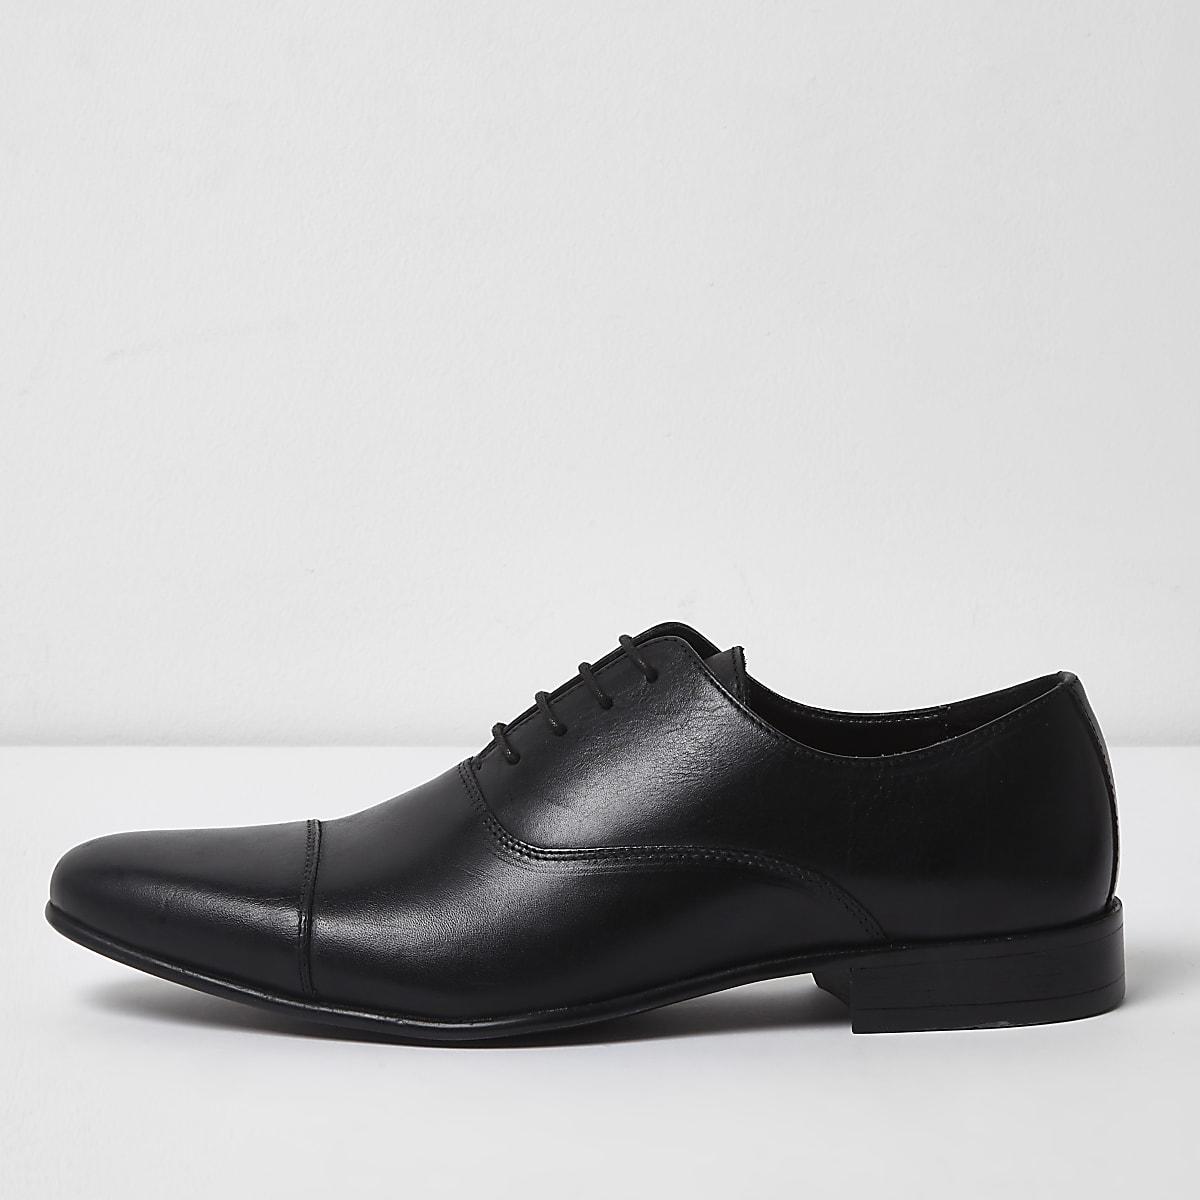 Black leather toe cap Oxford shoes